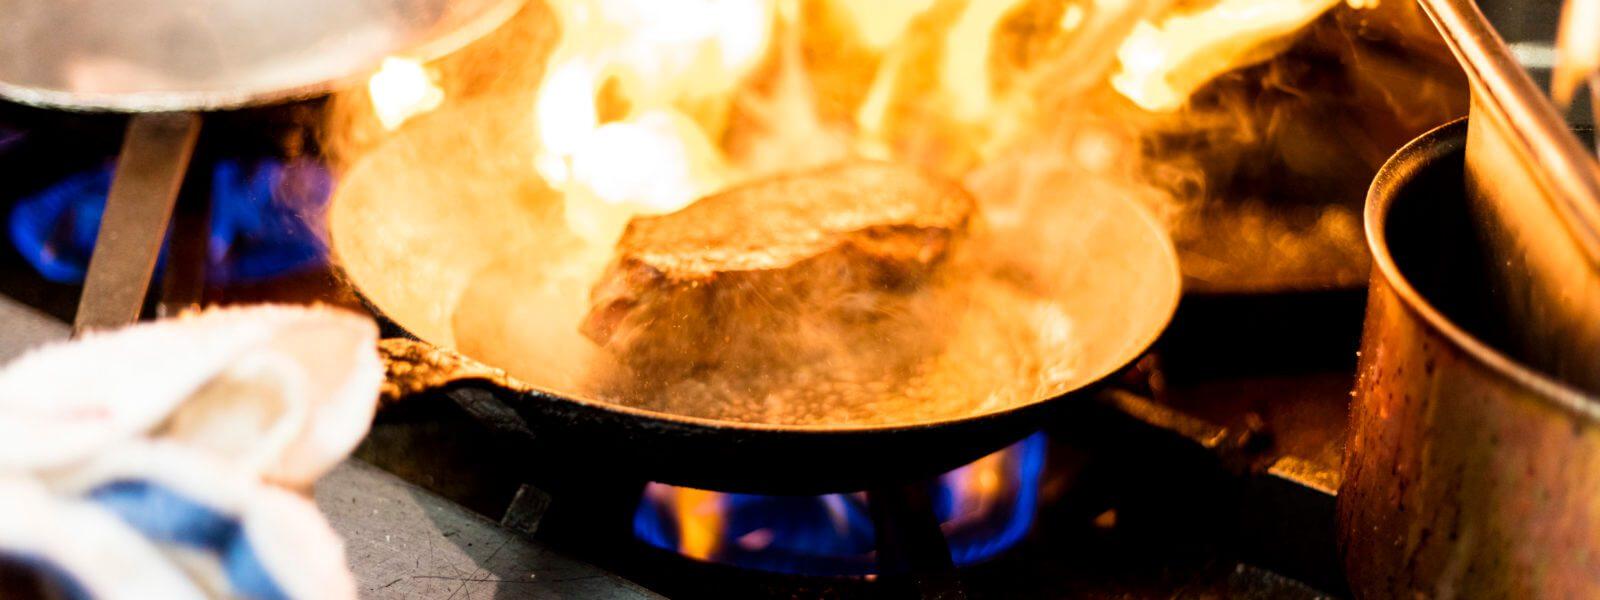 Steak flambéed in saute pan.